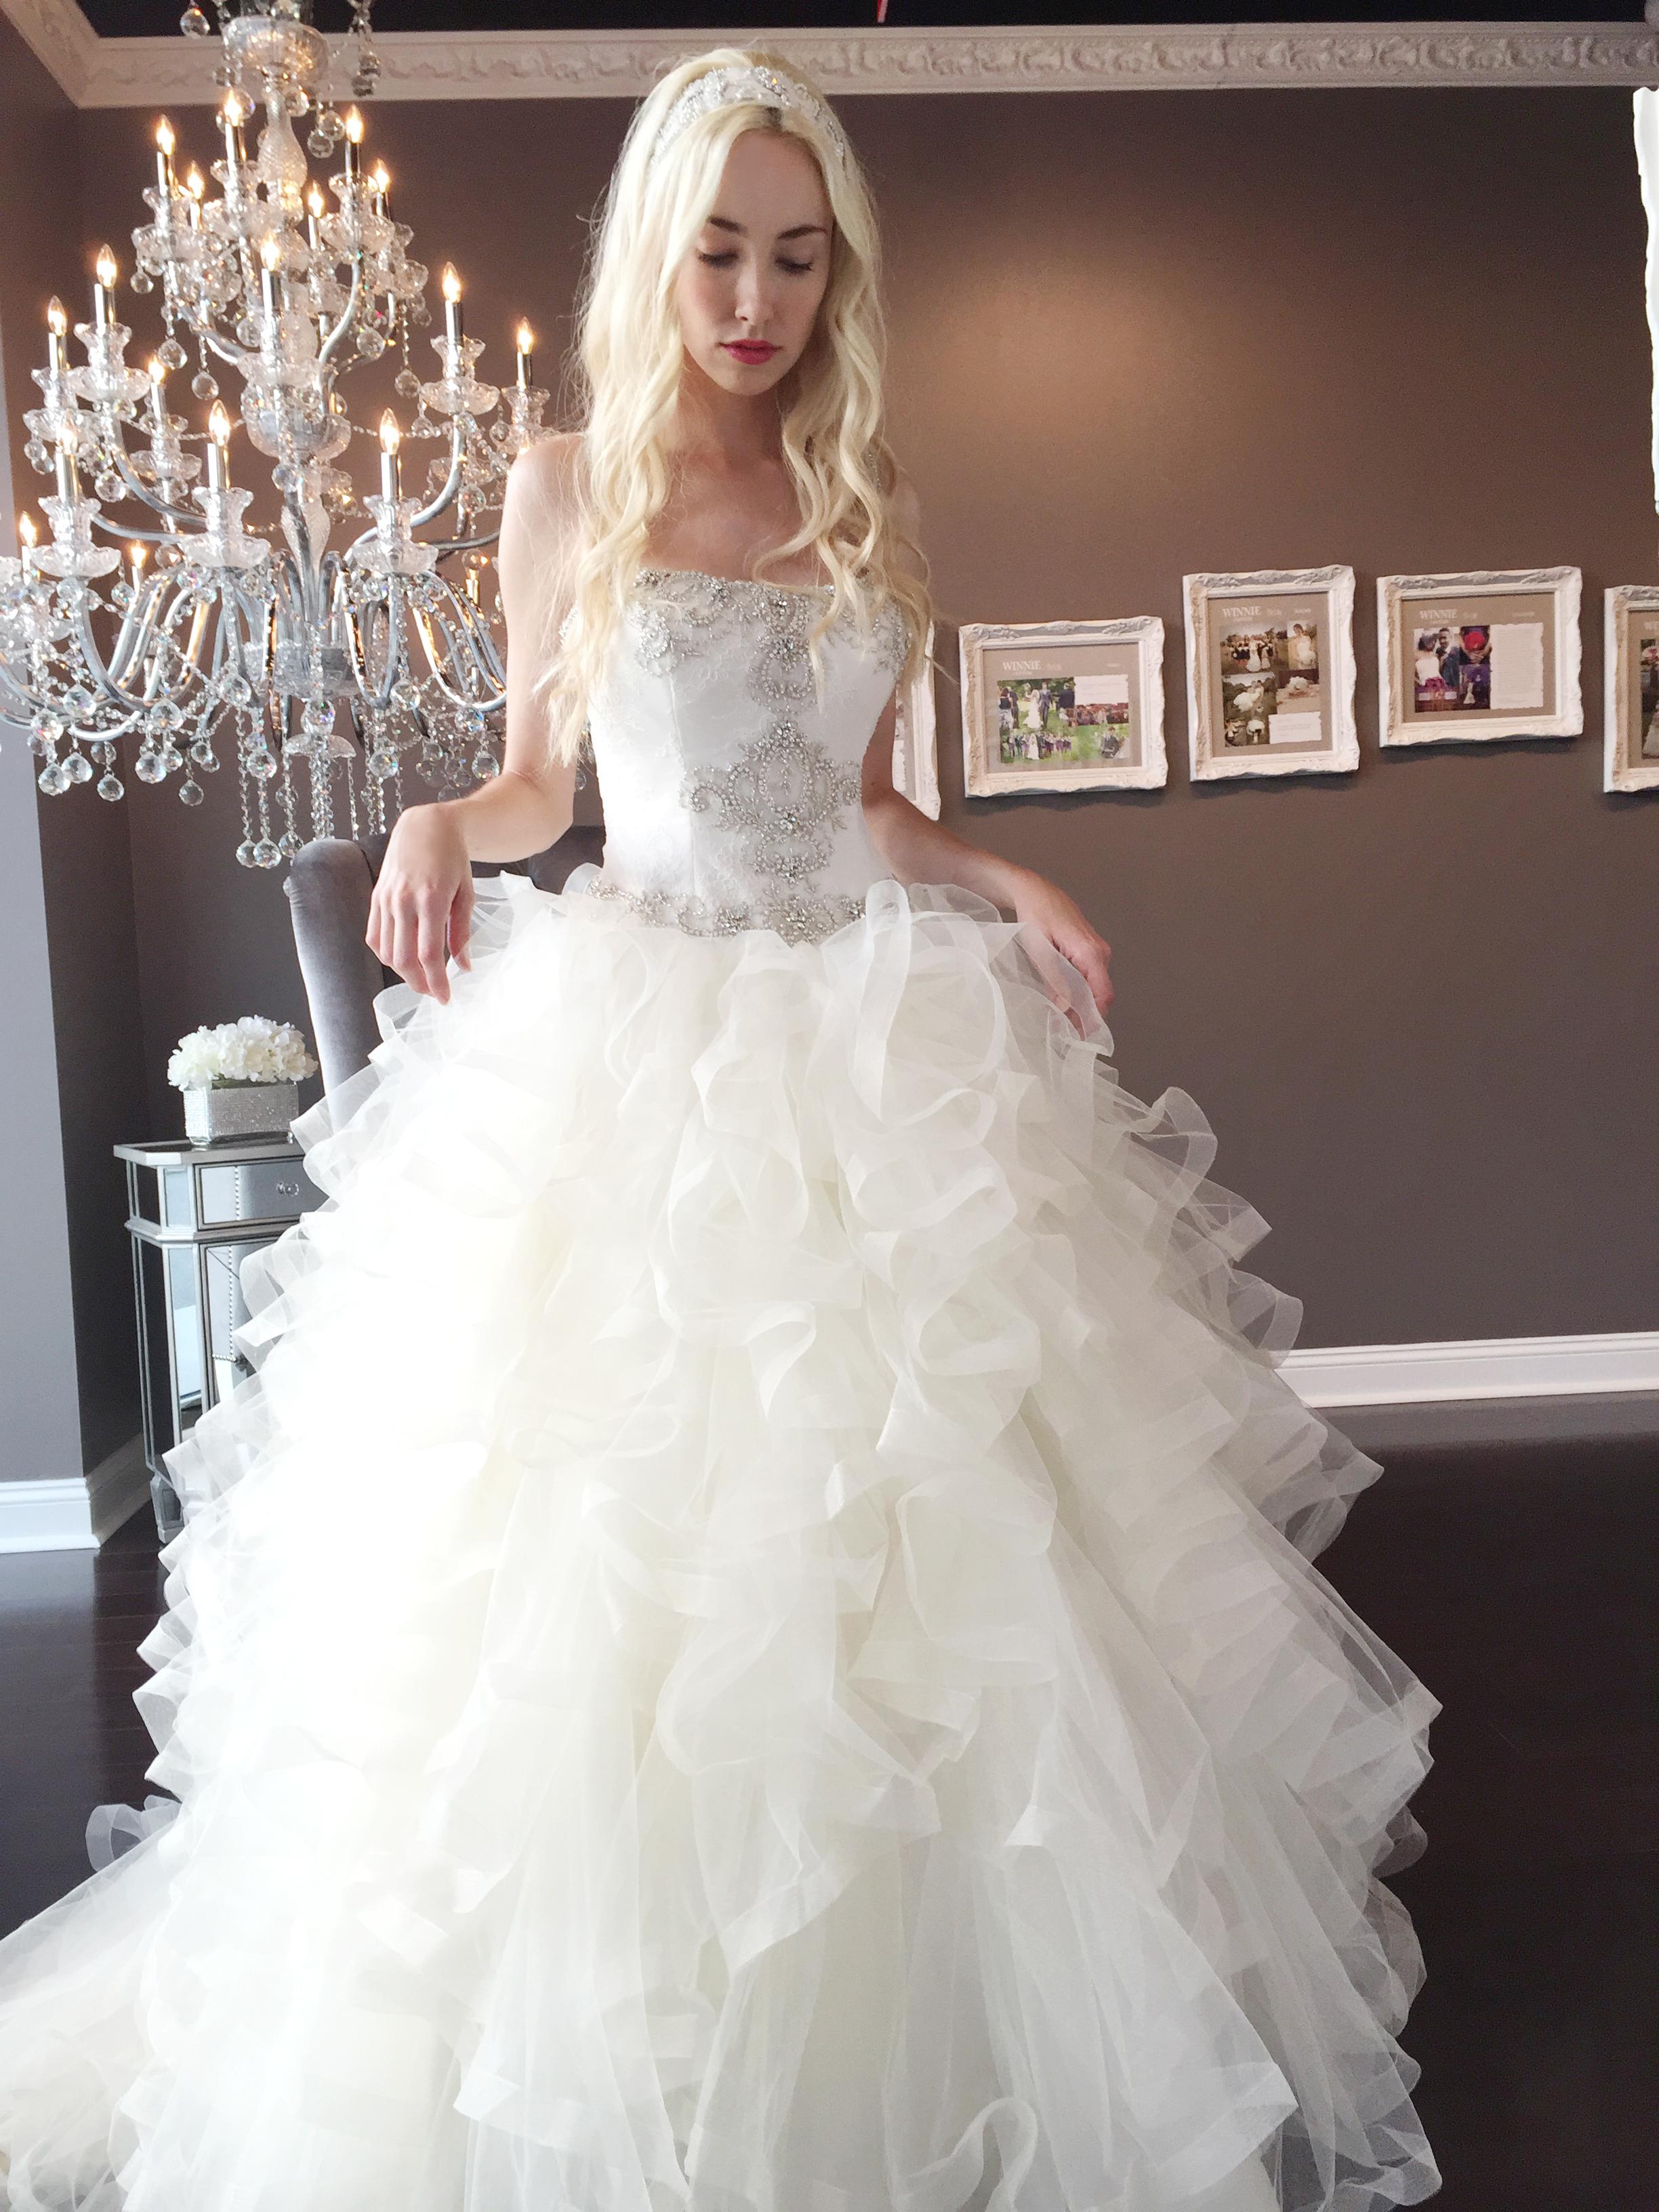 texas wedding dresses photo - 1